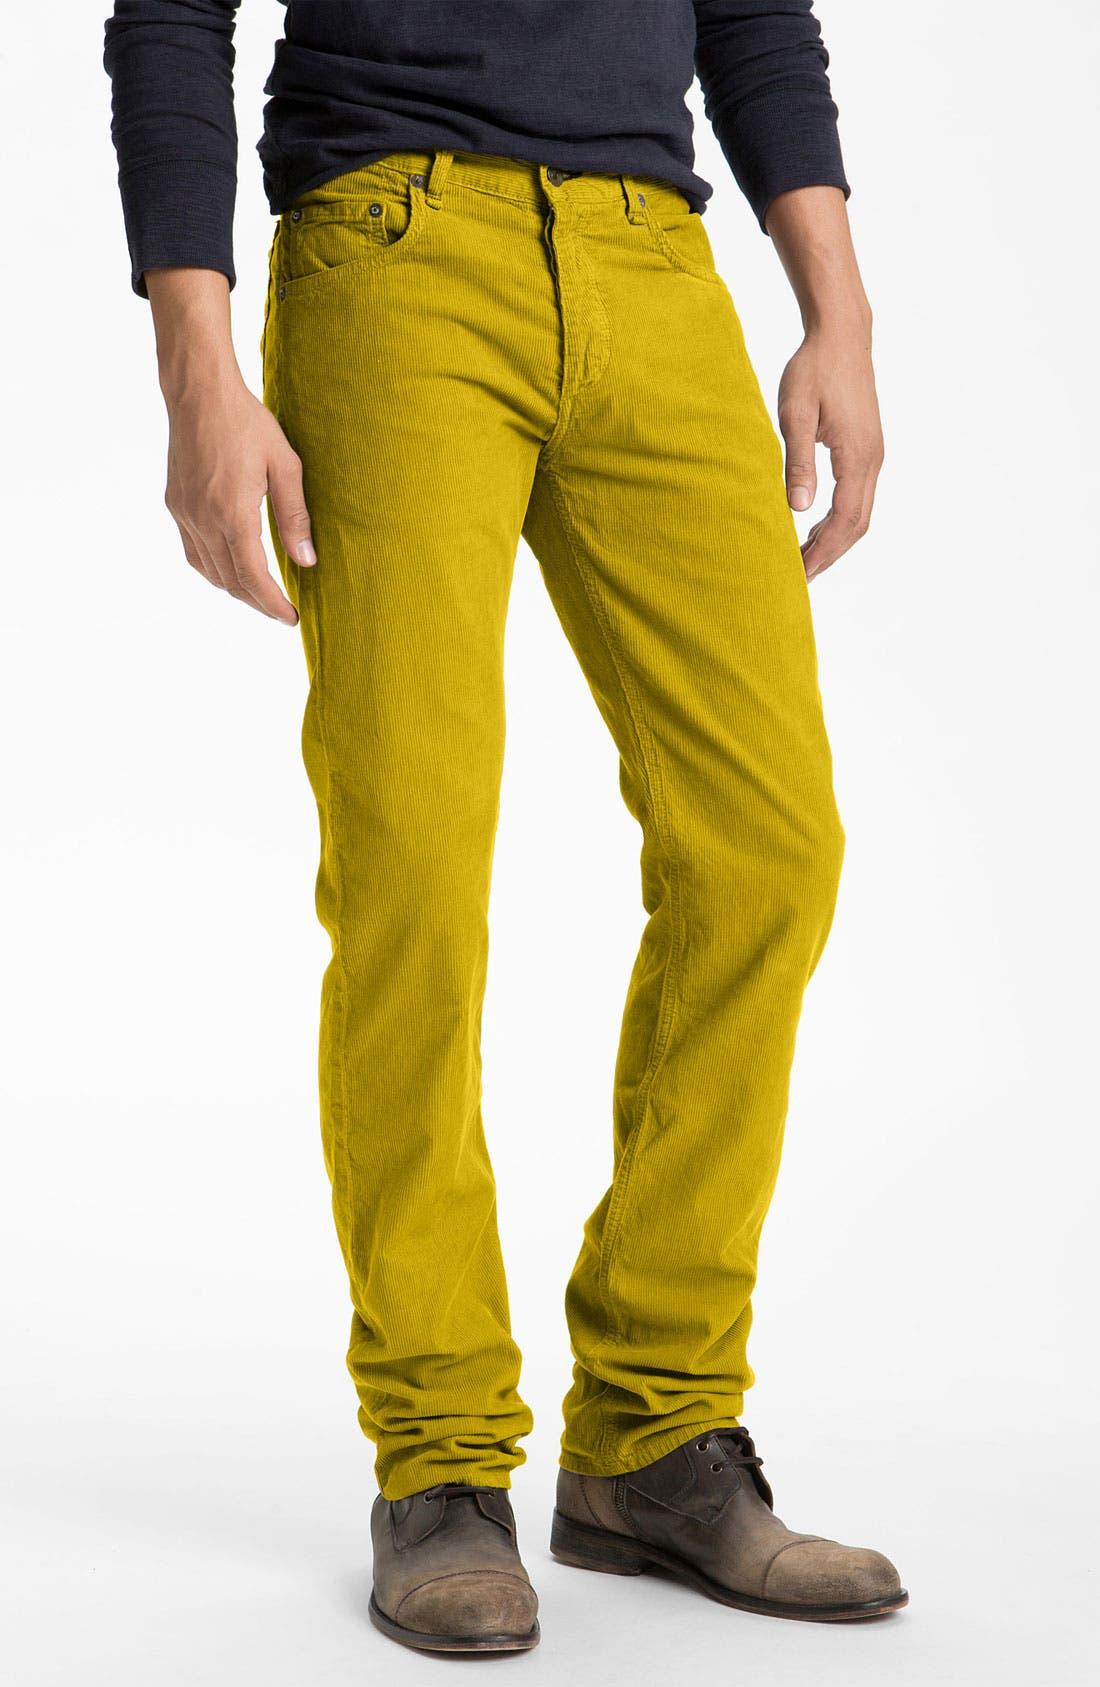 Alternate Image 1 Selected - rag & bone 'RB15X-C' Corduroy Pants